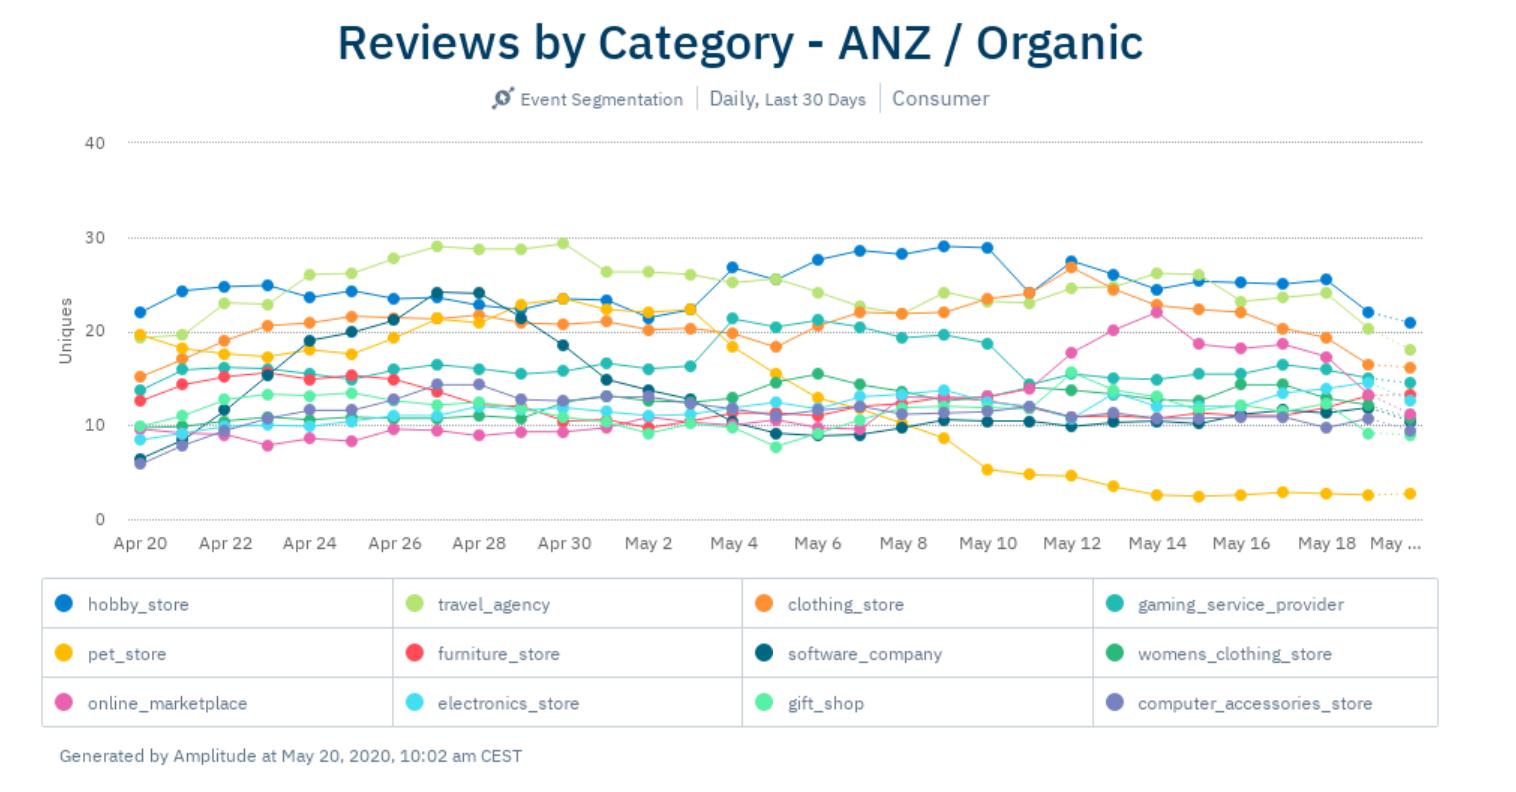 apr6-ANZ-organic-reviews